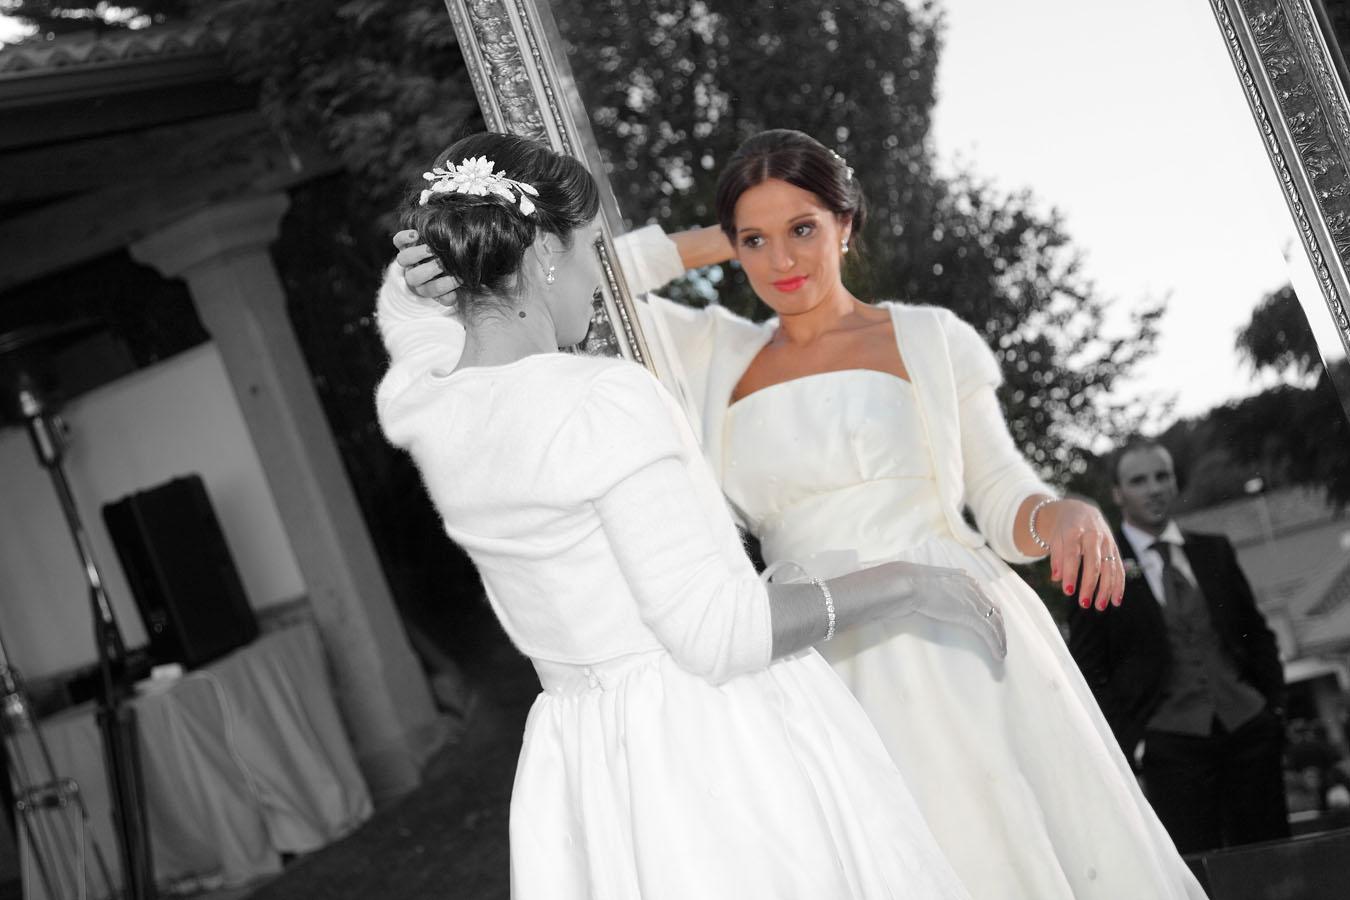 boda-civi-chicolino-enlace-sandra-y-adrian-033